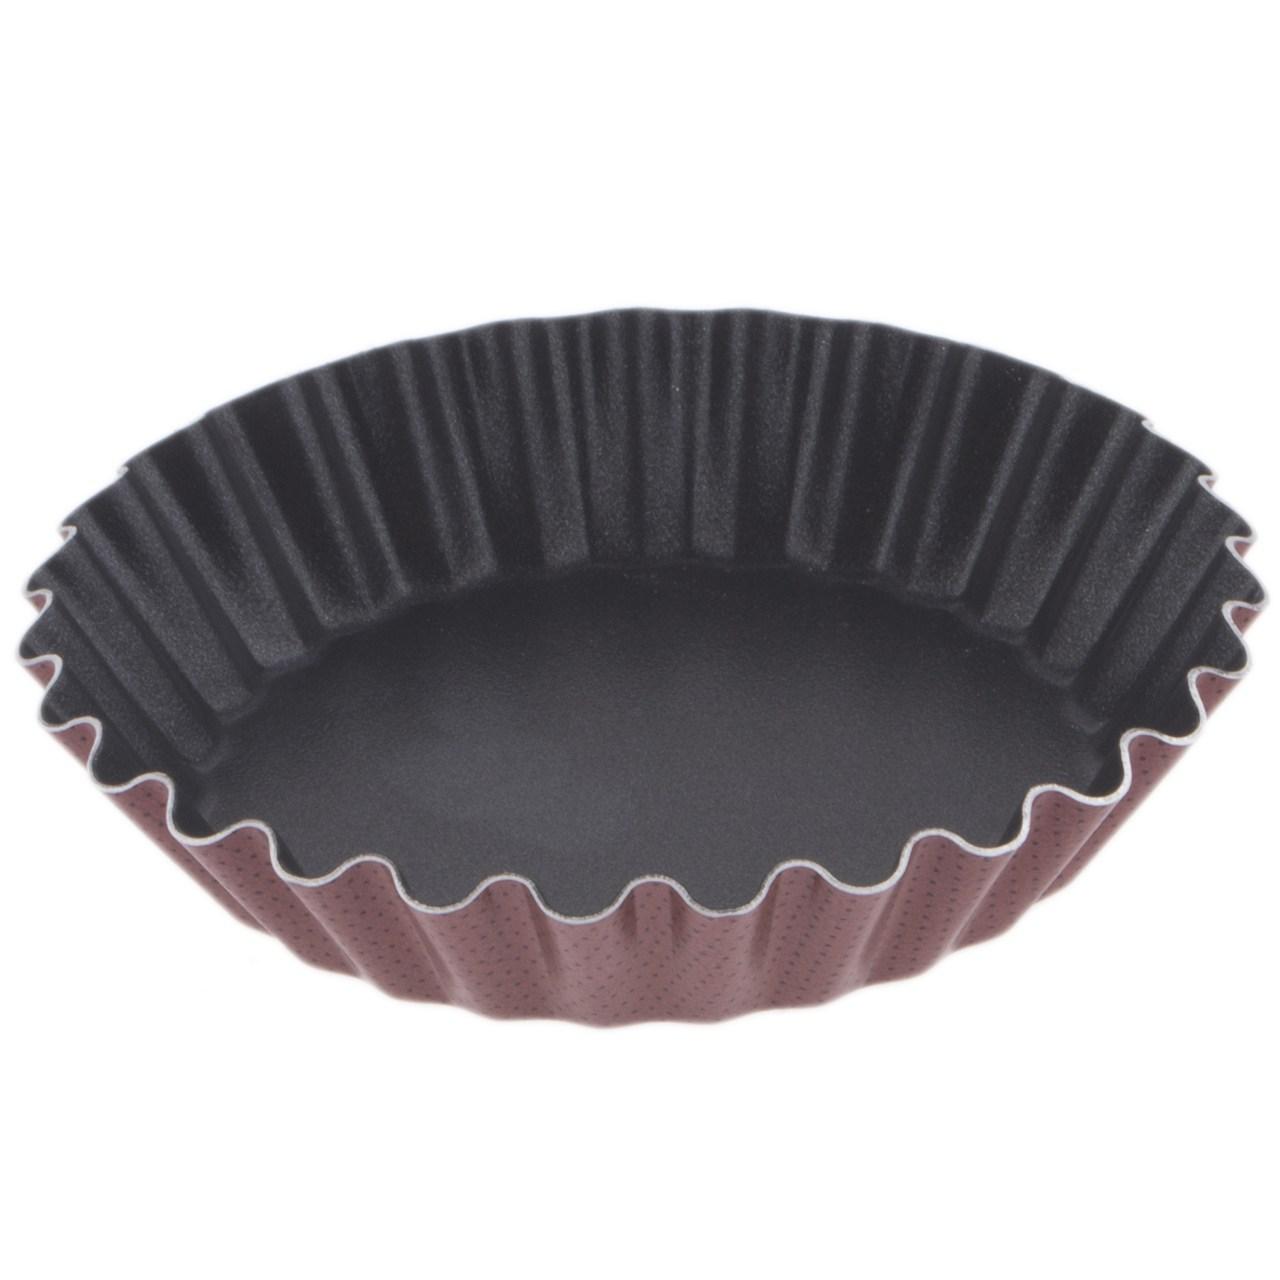 قالب کیک تارت تفال مدل New Patisserie سایز 11 بسته 4 عددی